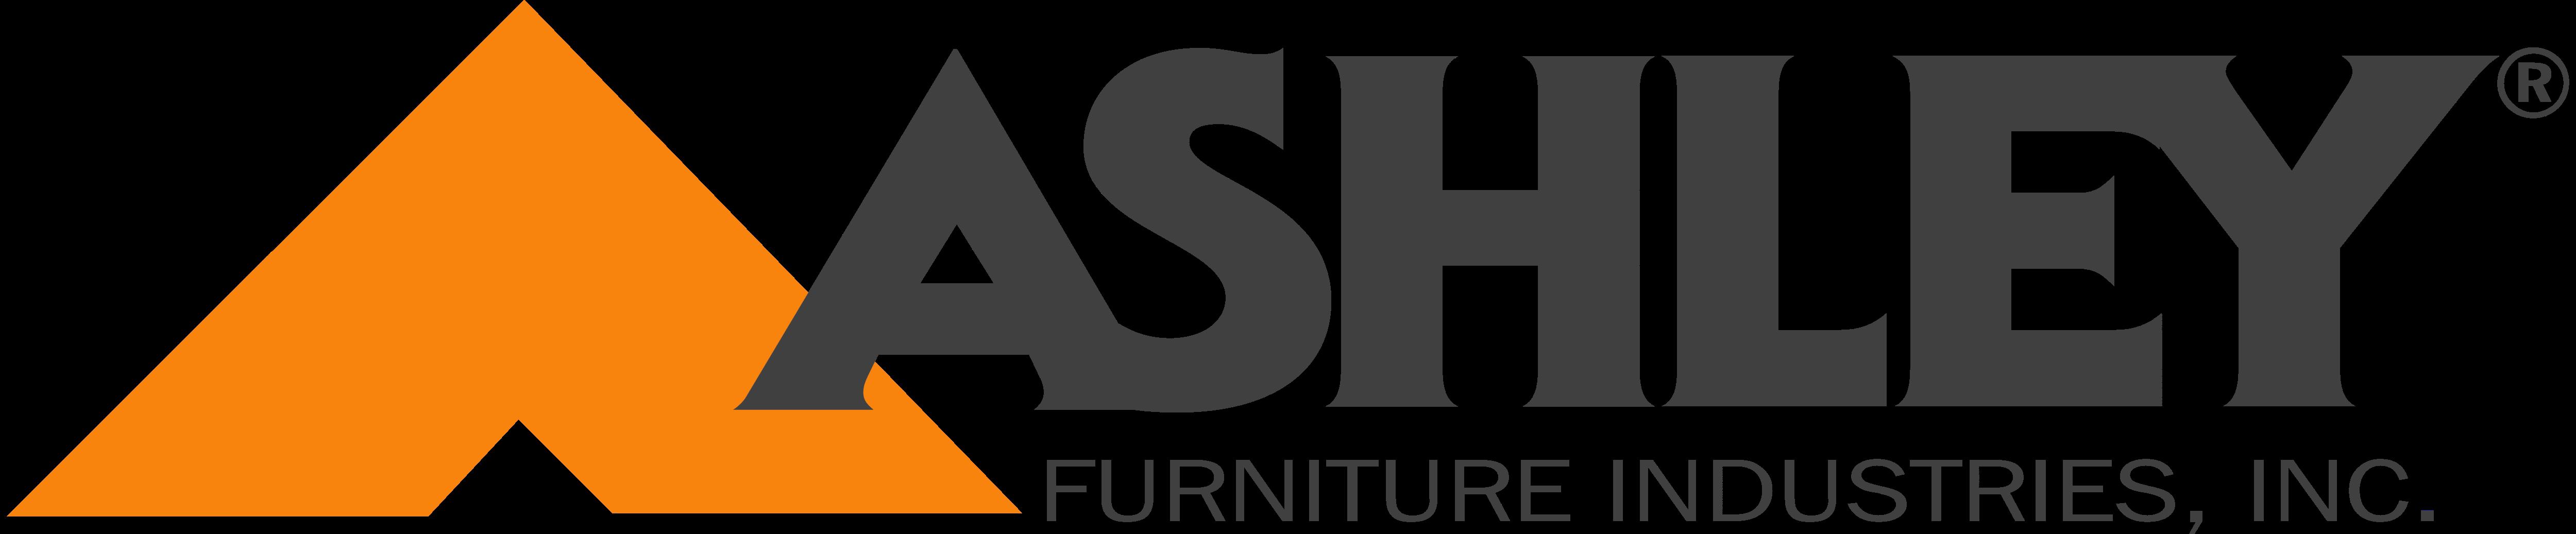 ashley-furniture-logo-png-ashley-furniture-log